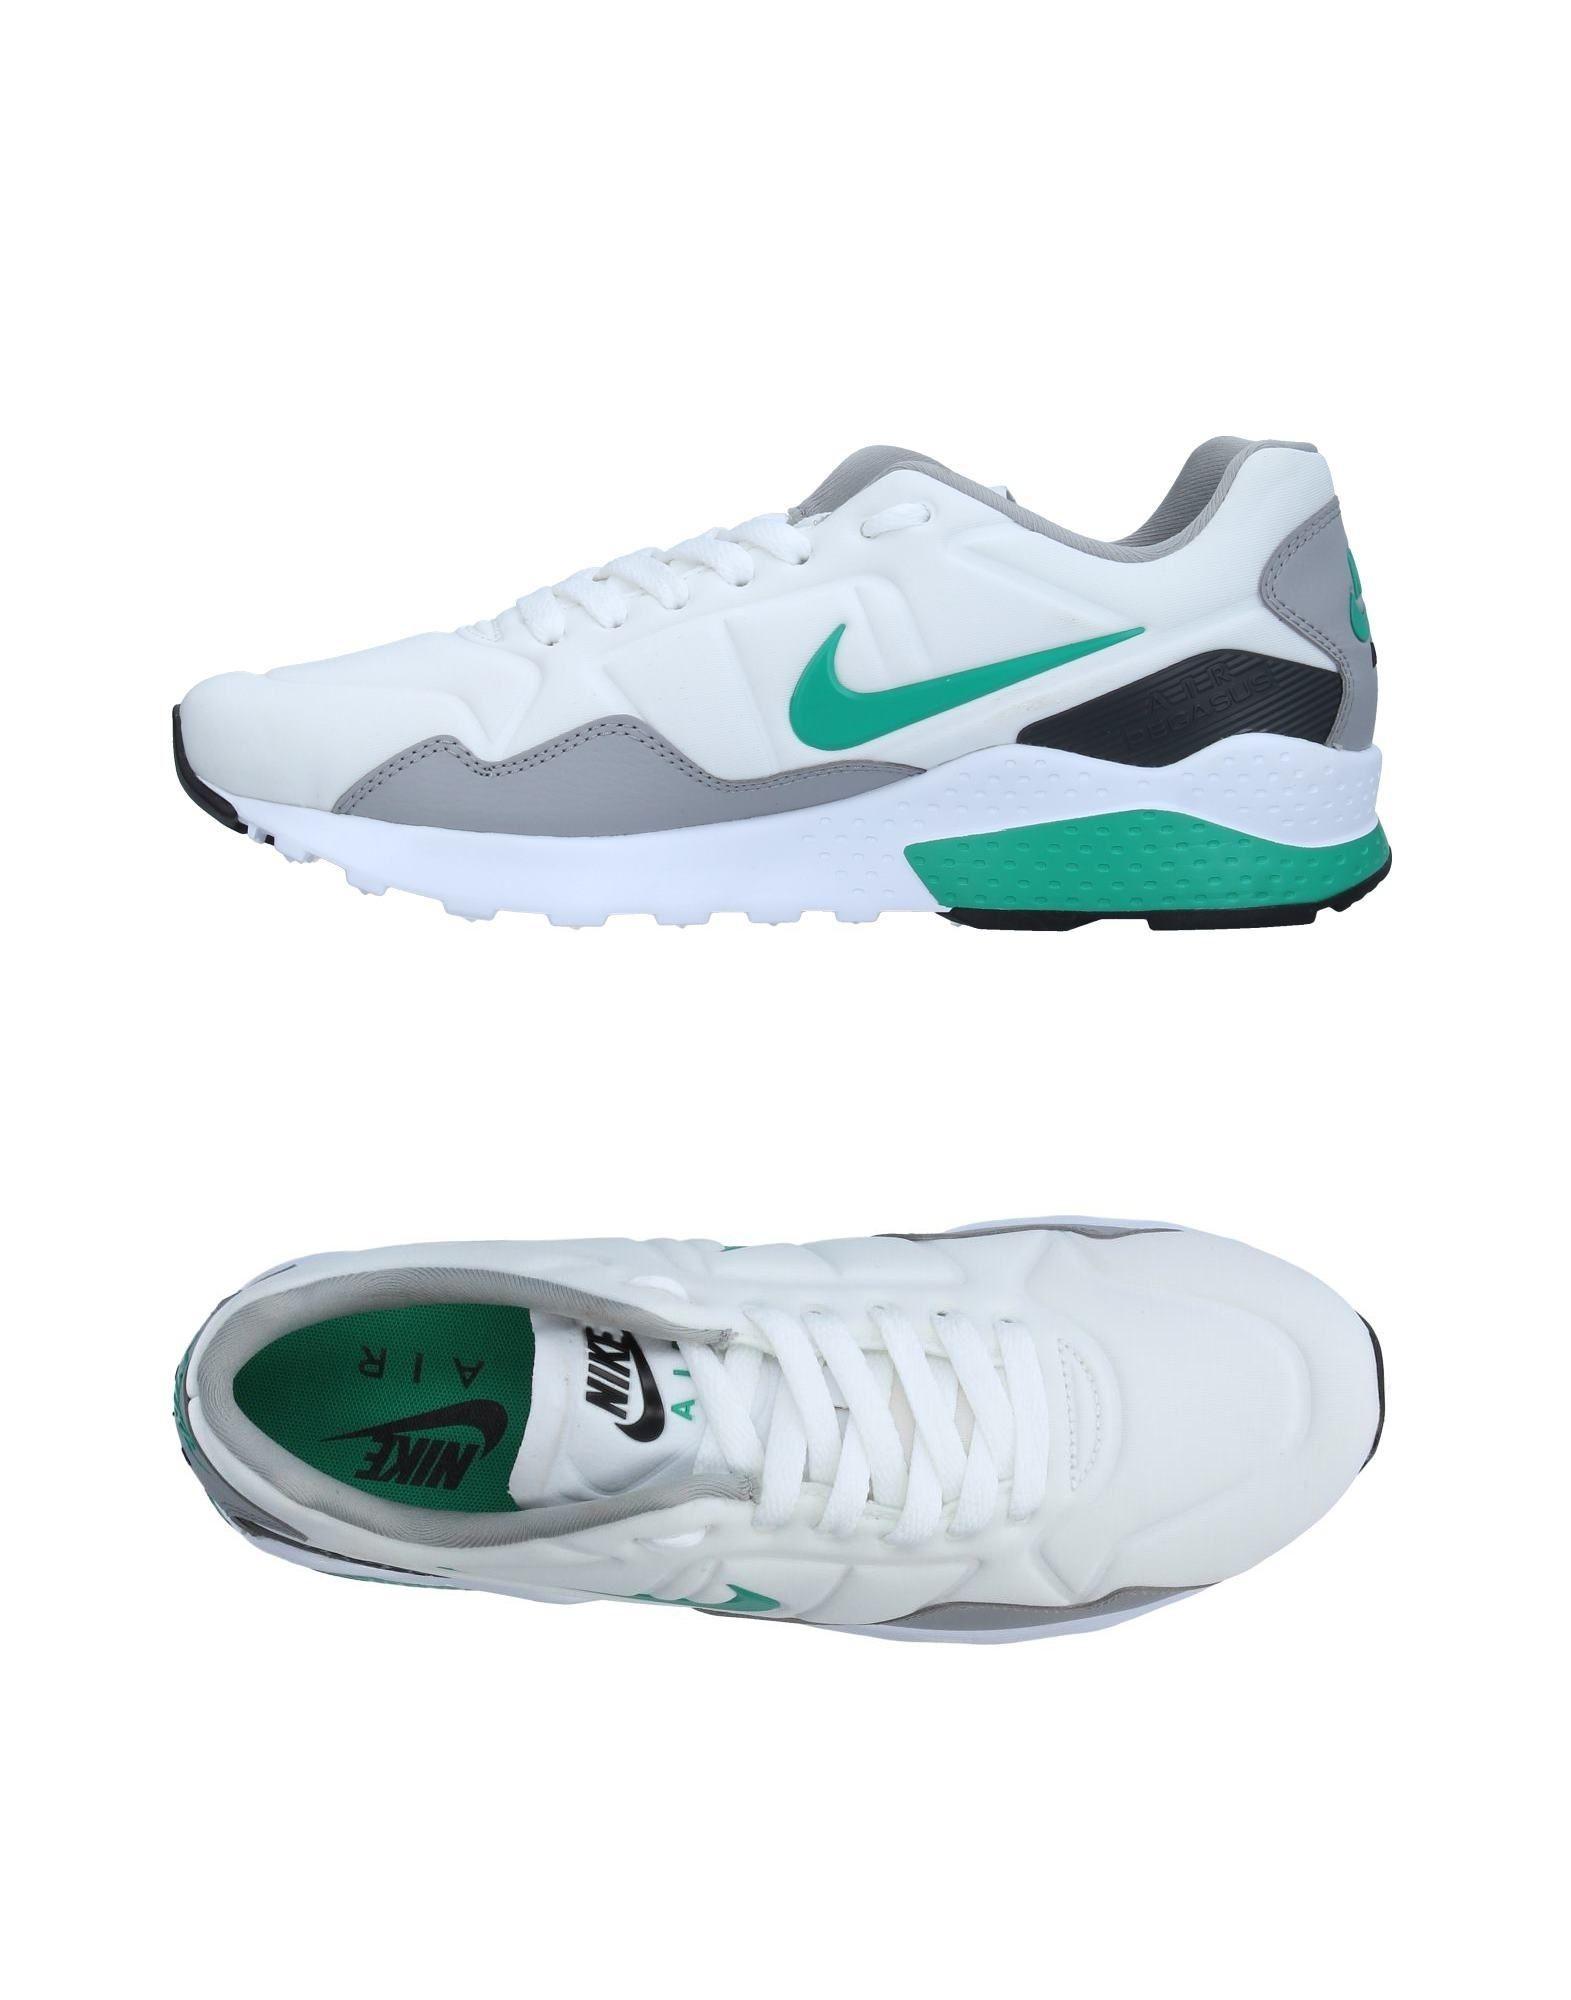 Moda Sneakers Nike Uomo - 11335595VW